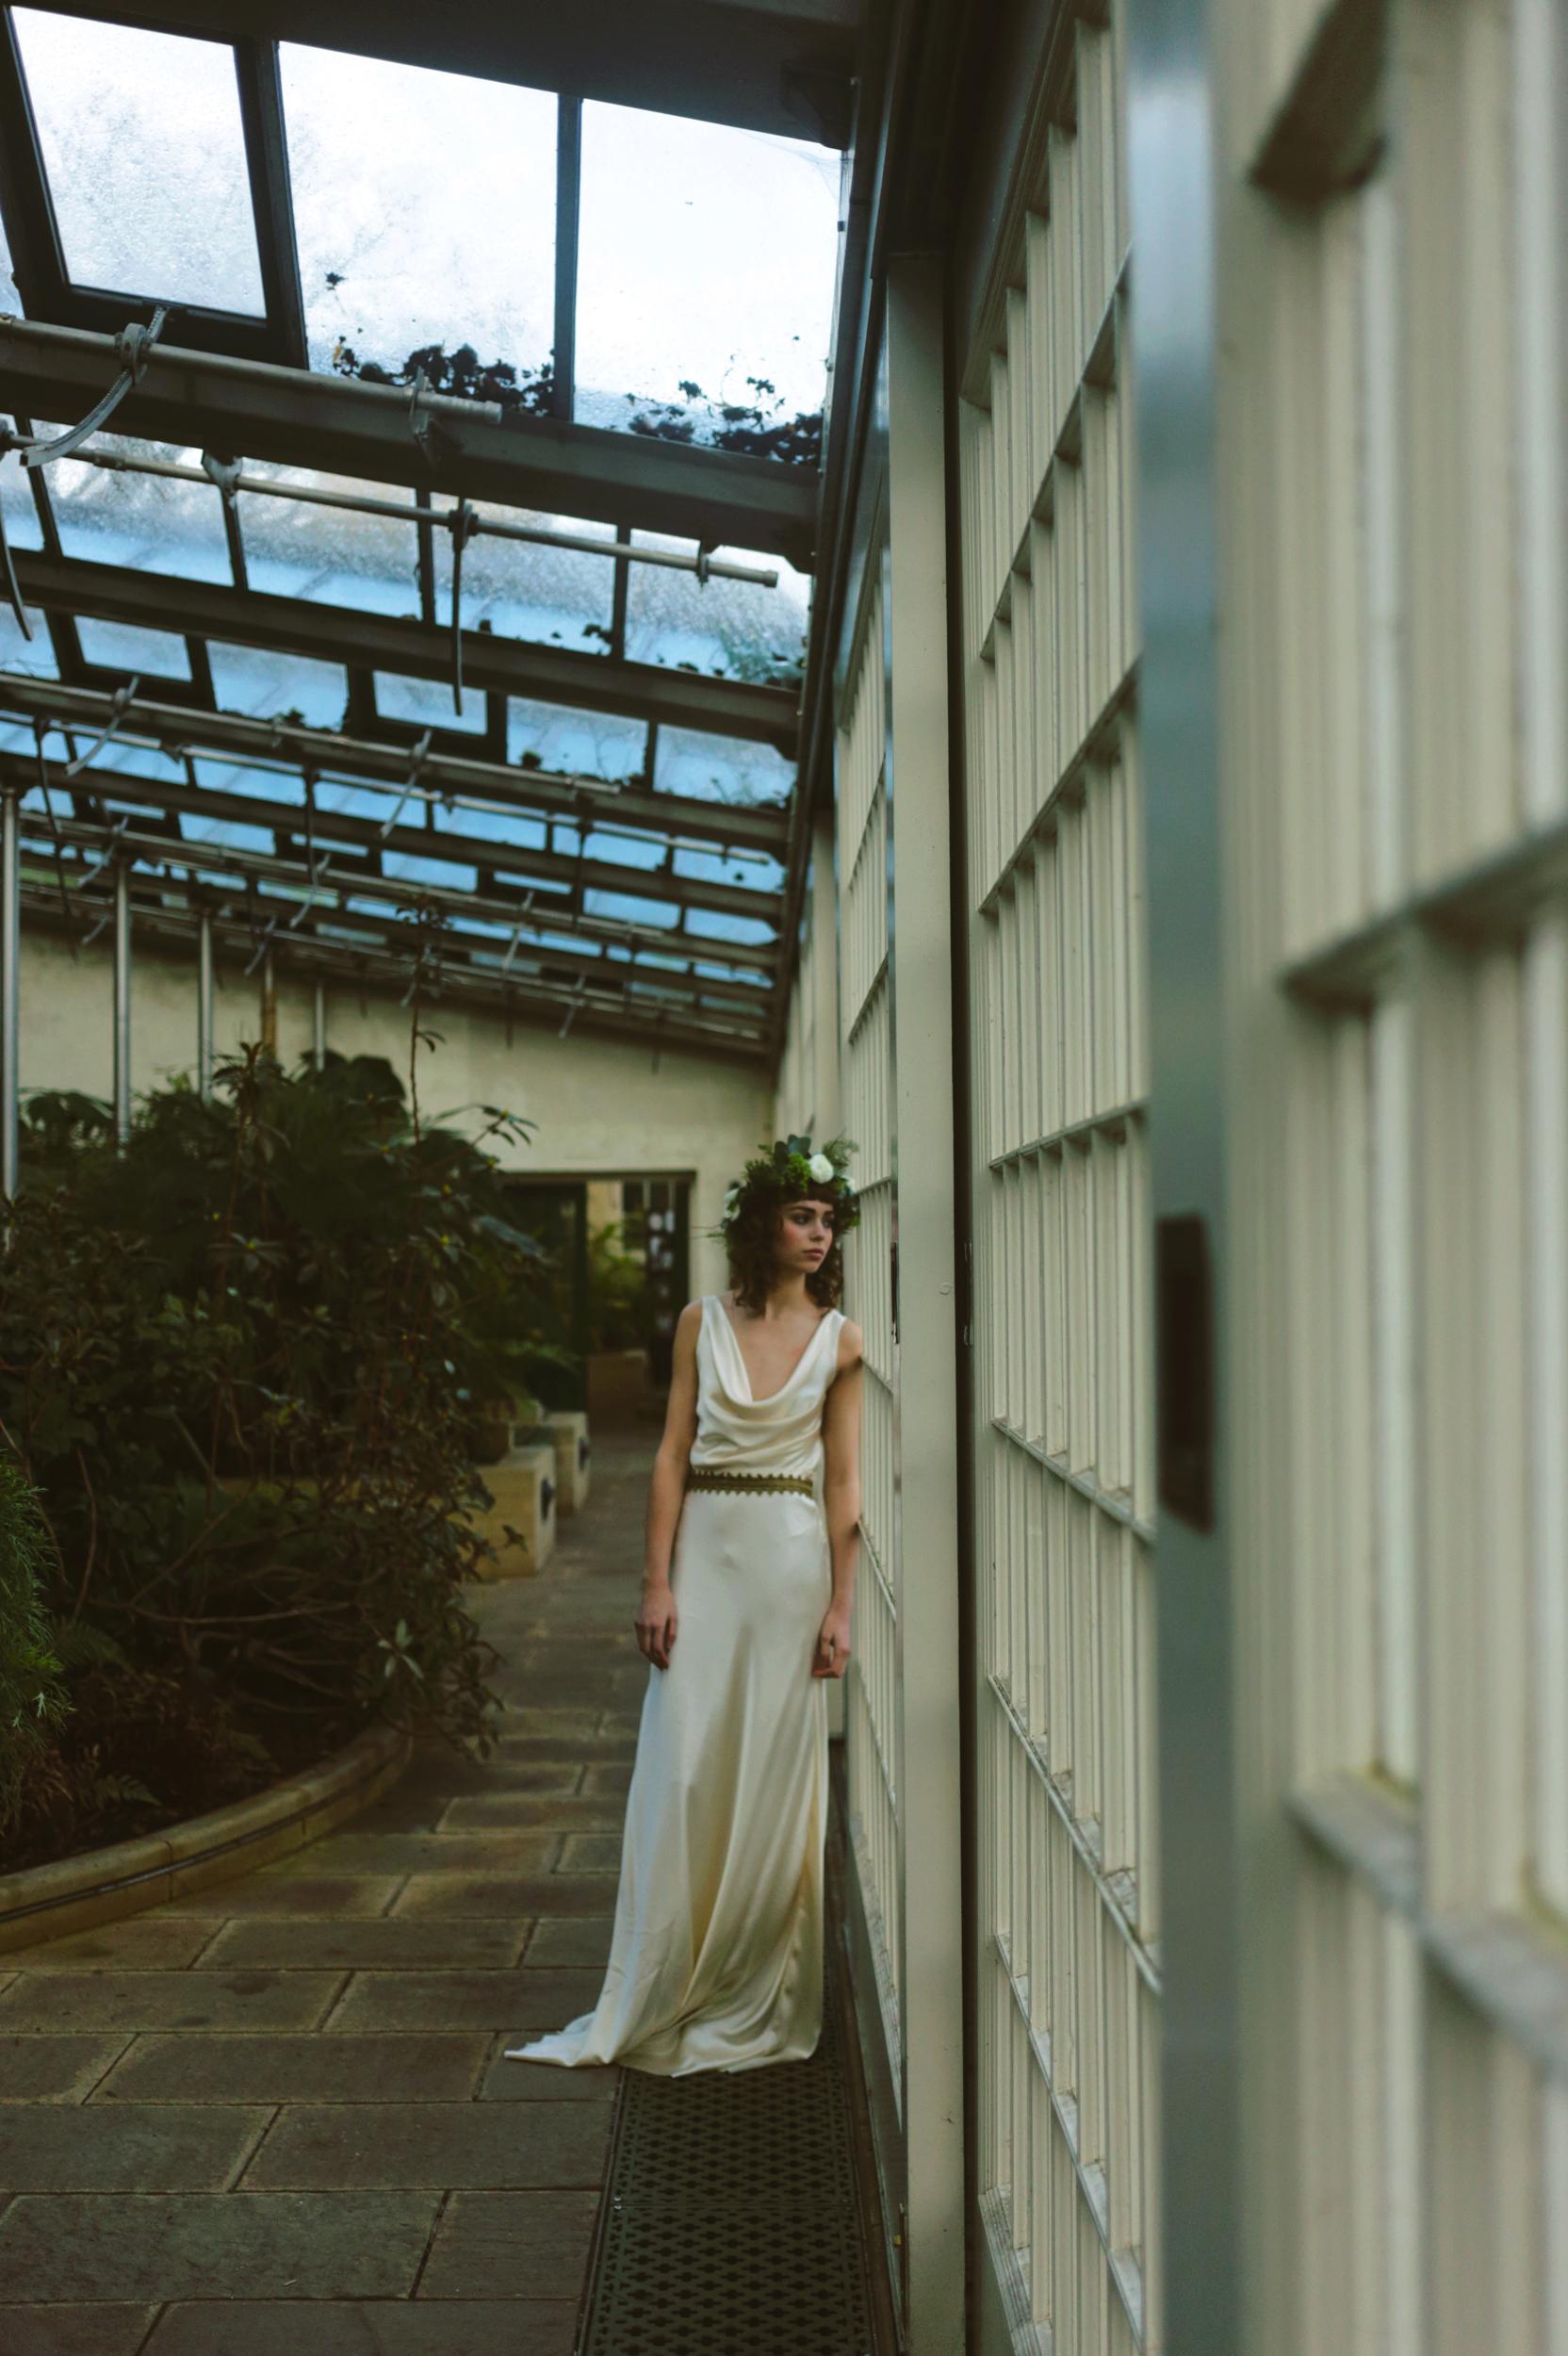 Winter-Bridal-Kate-Beaumont-Shelley-Richmond-Vintage-Wedding-Dress-10.jpg